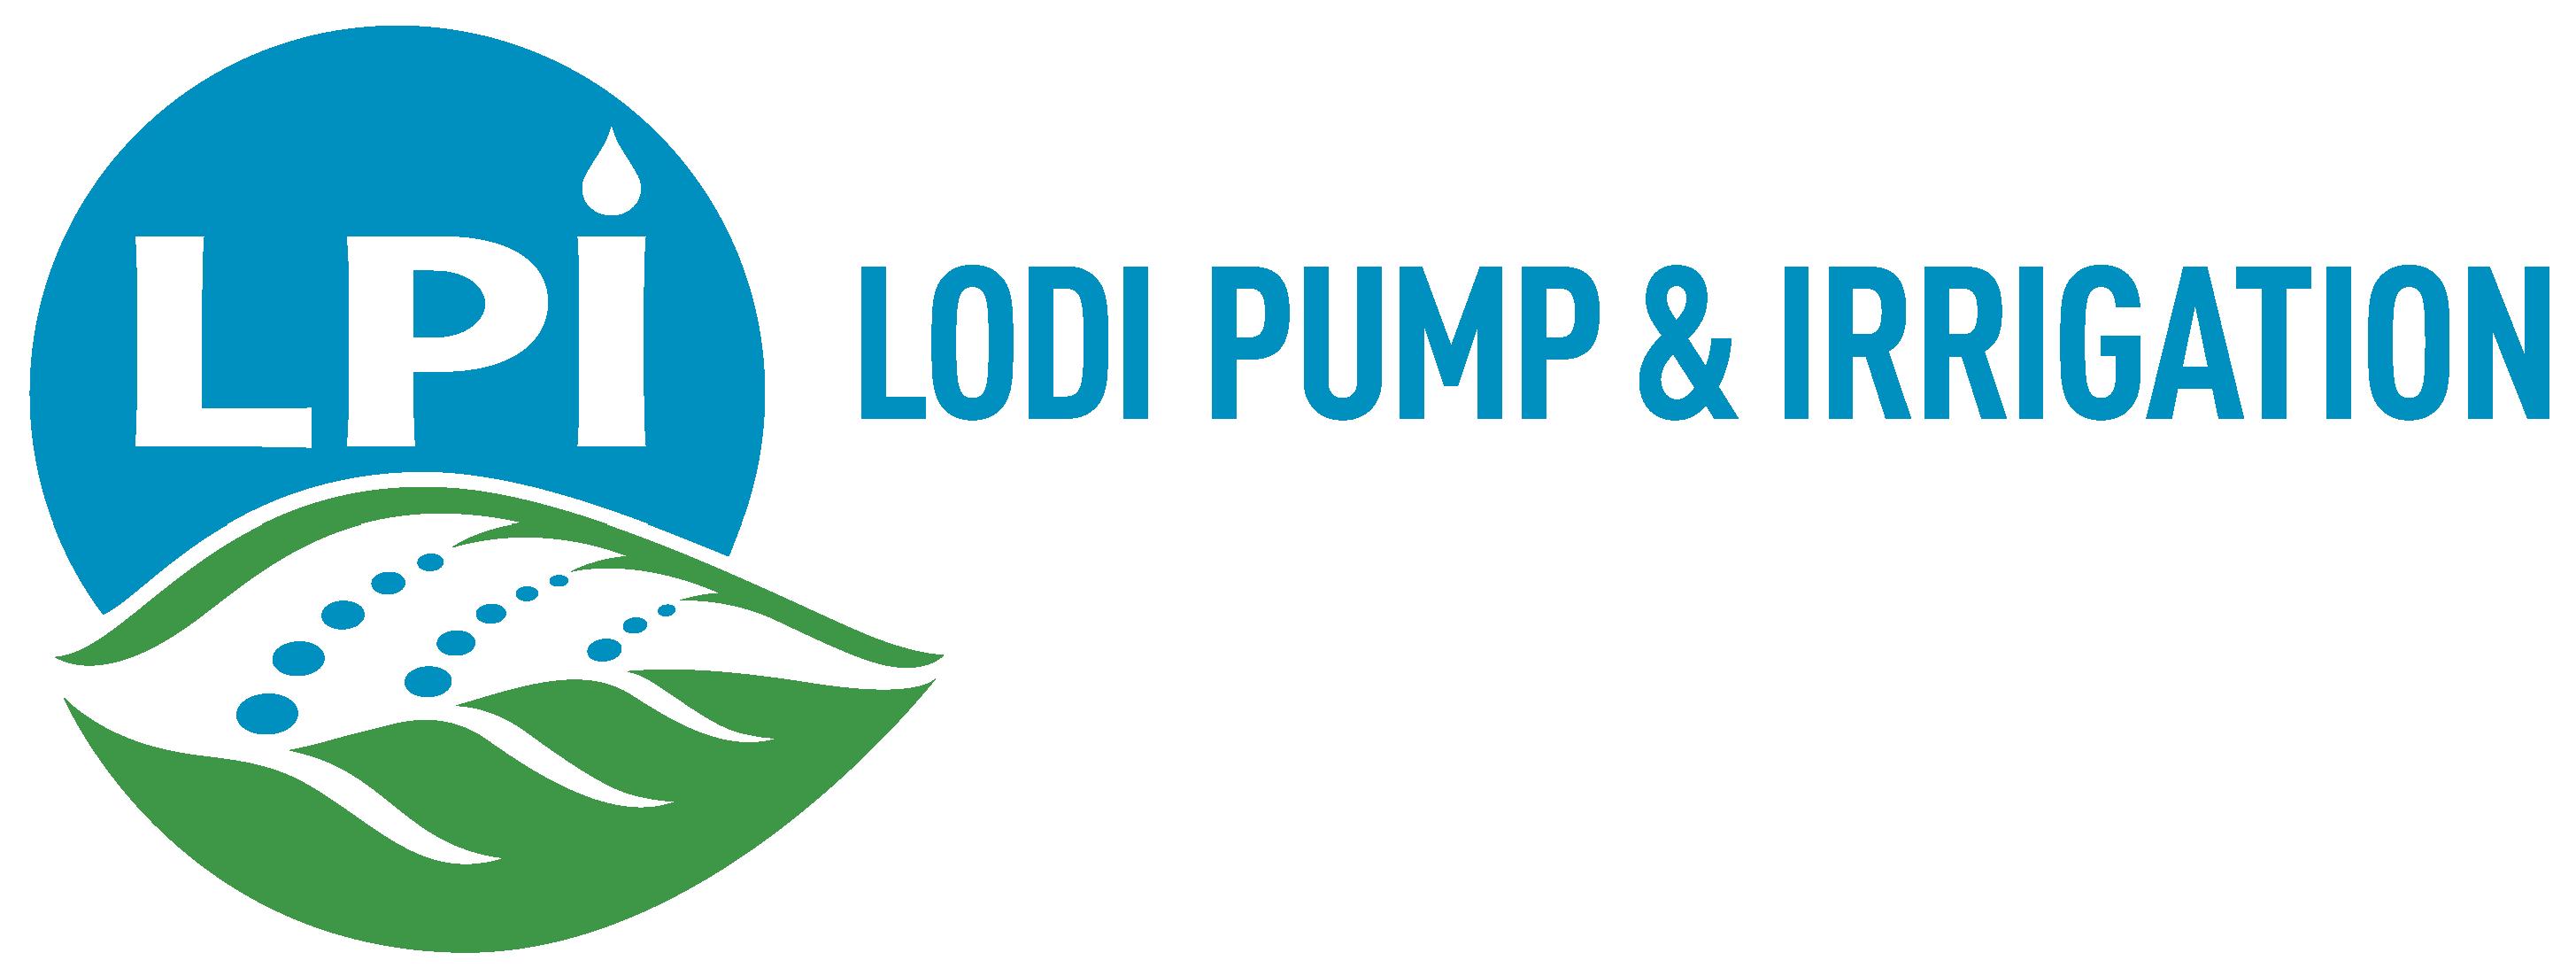 Lodi Pump & Irrigation logo